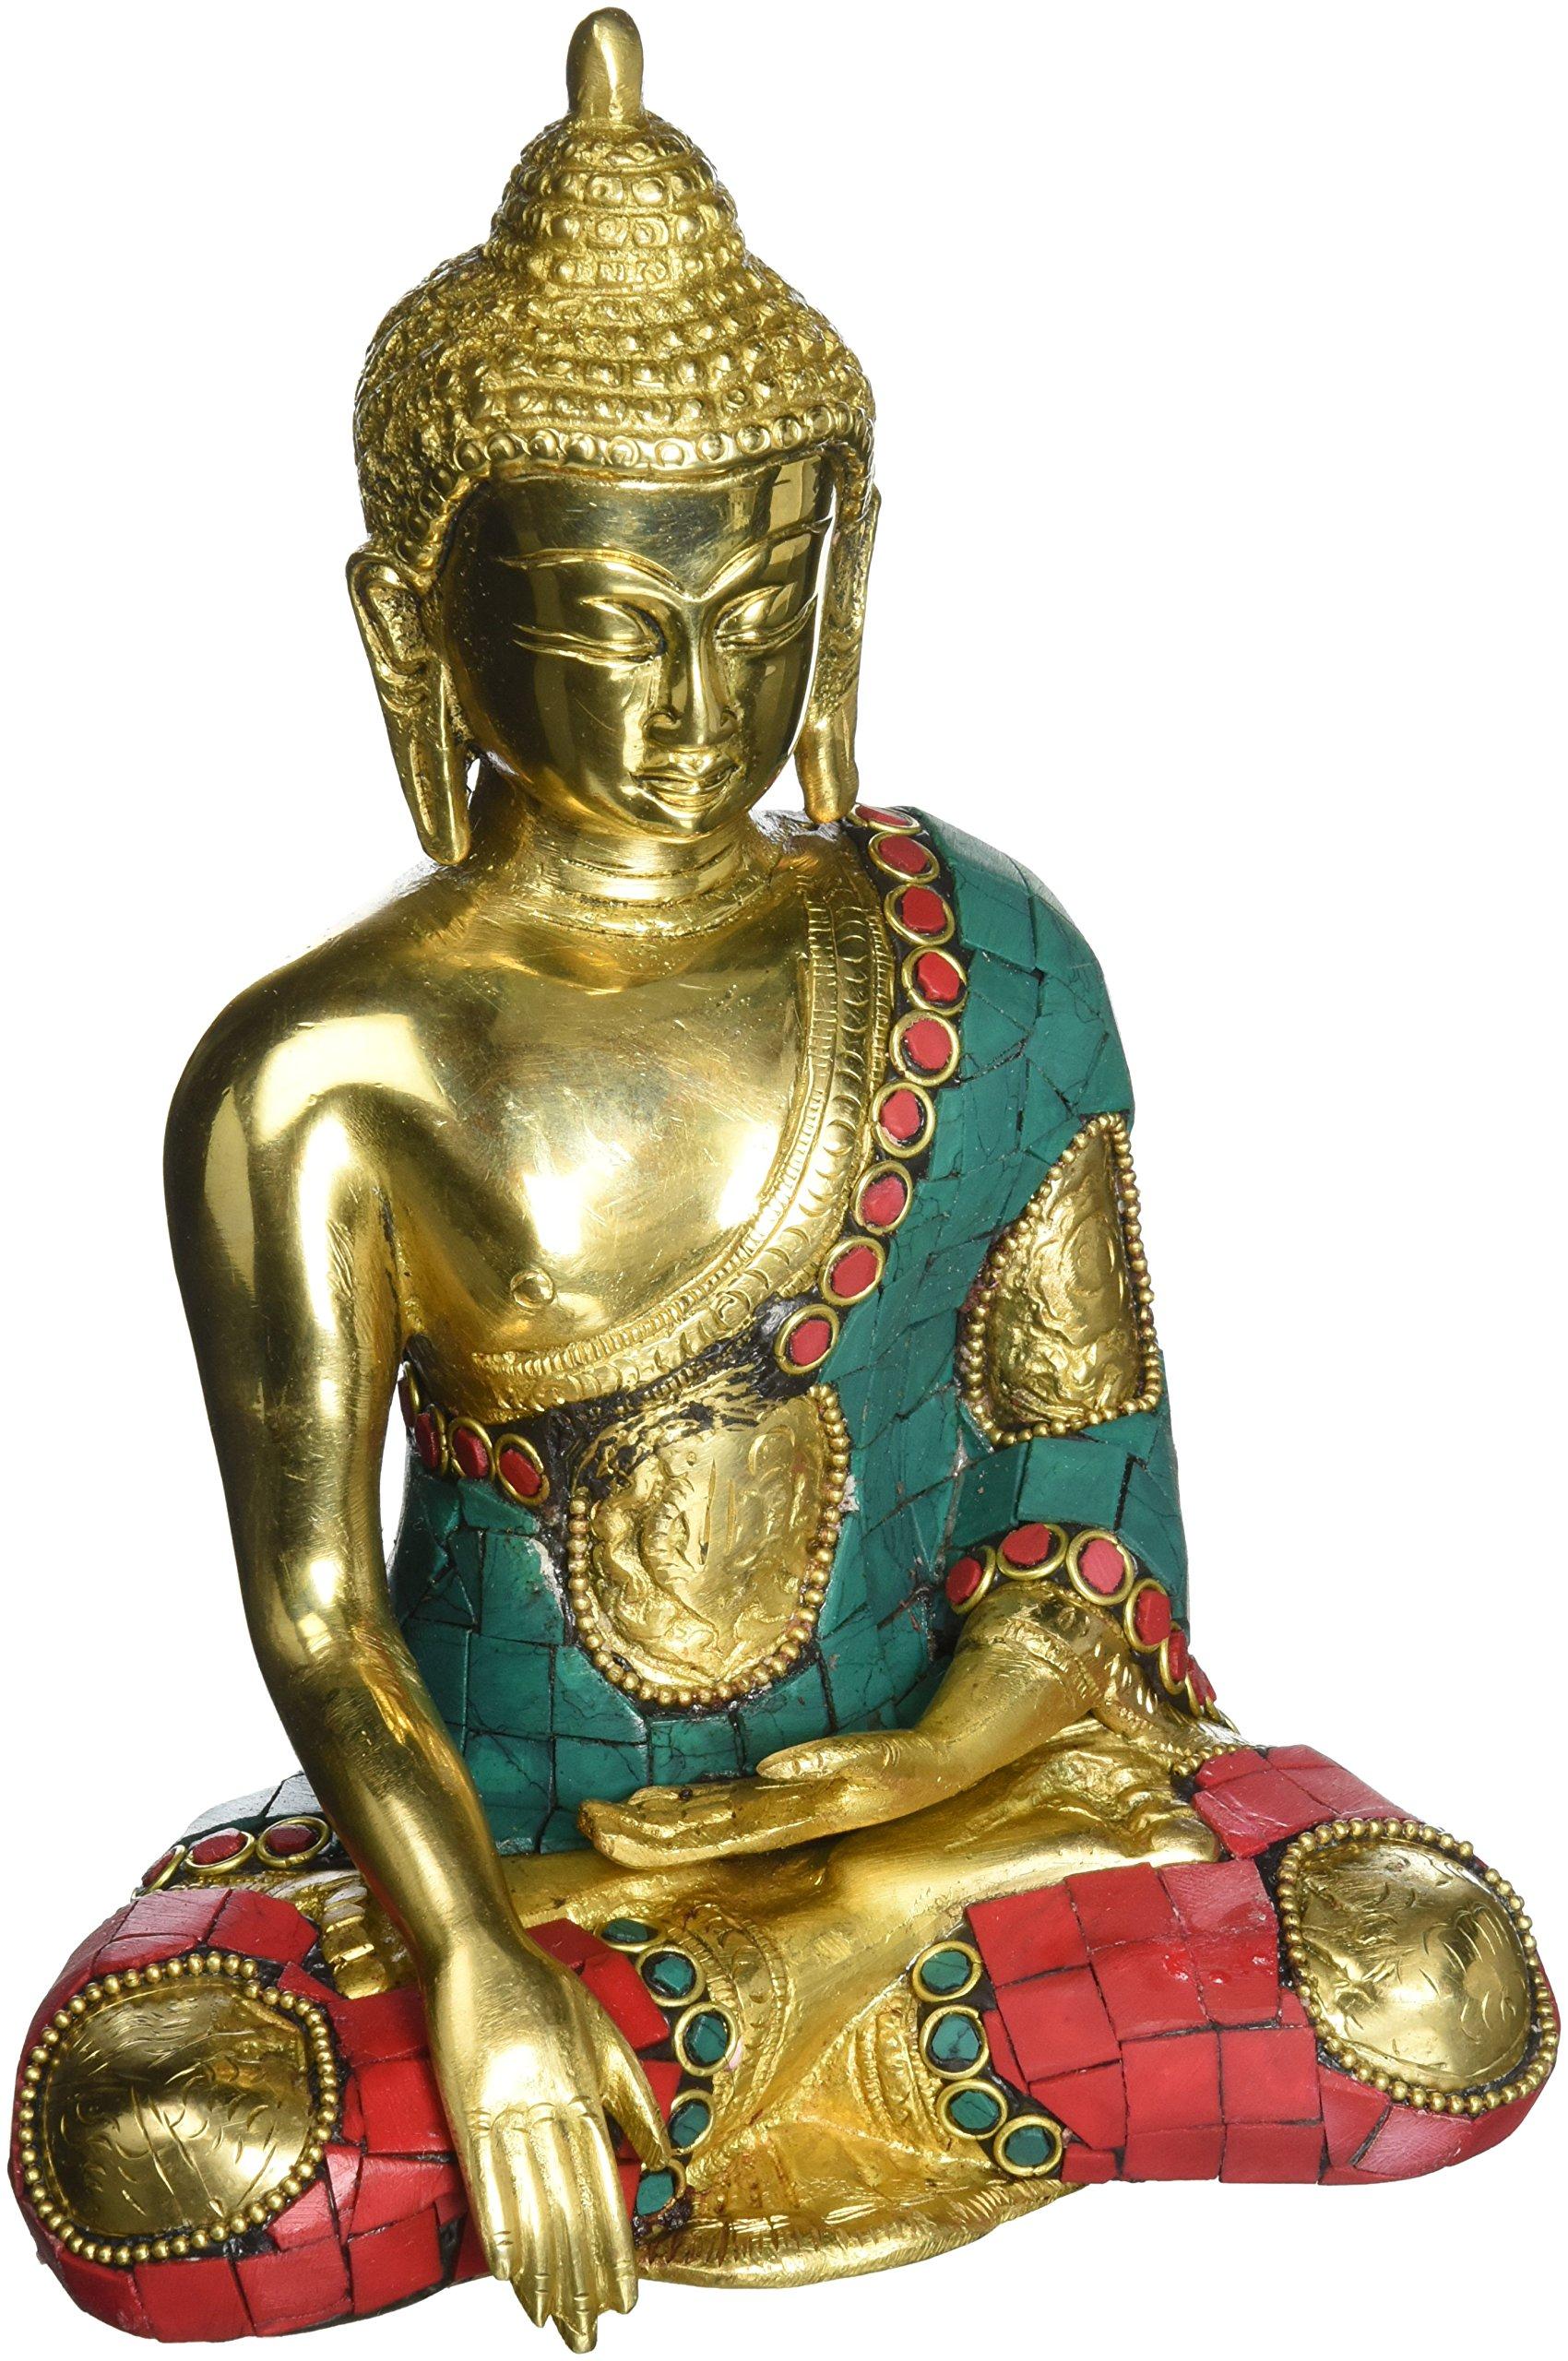 AapnoCraft 8'' Sakyamuni Thai Buddha Statue Large Sitting Buddha Idols Brass Asthmangal Turquoise Figurine Vastu Gifts